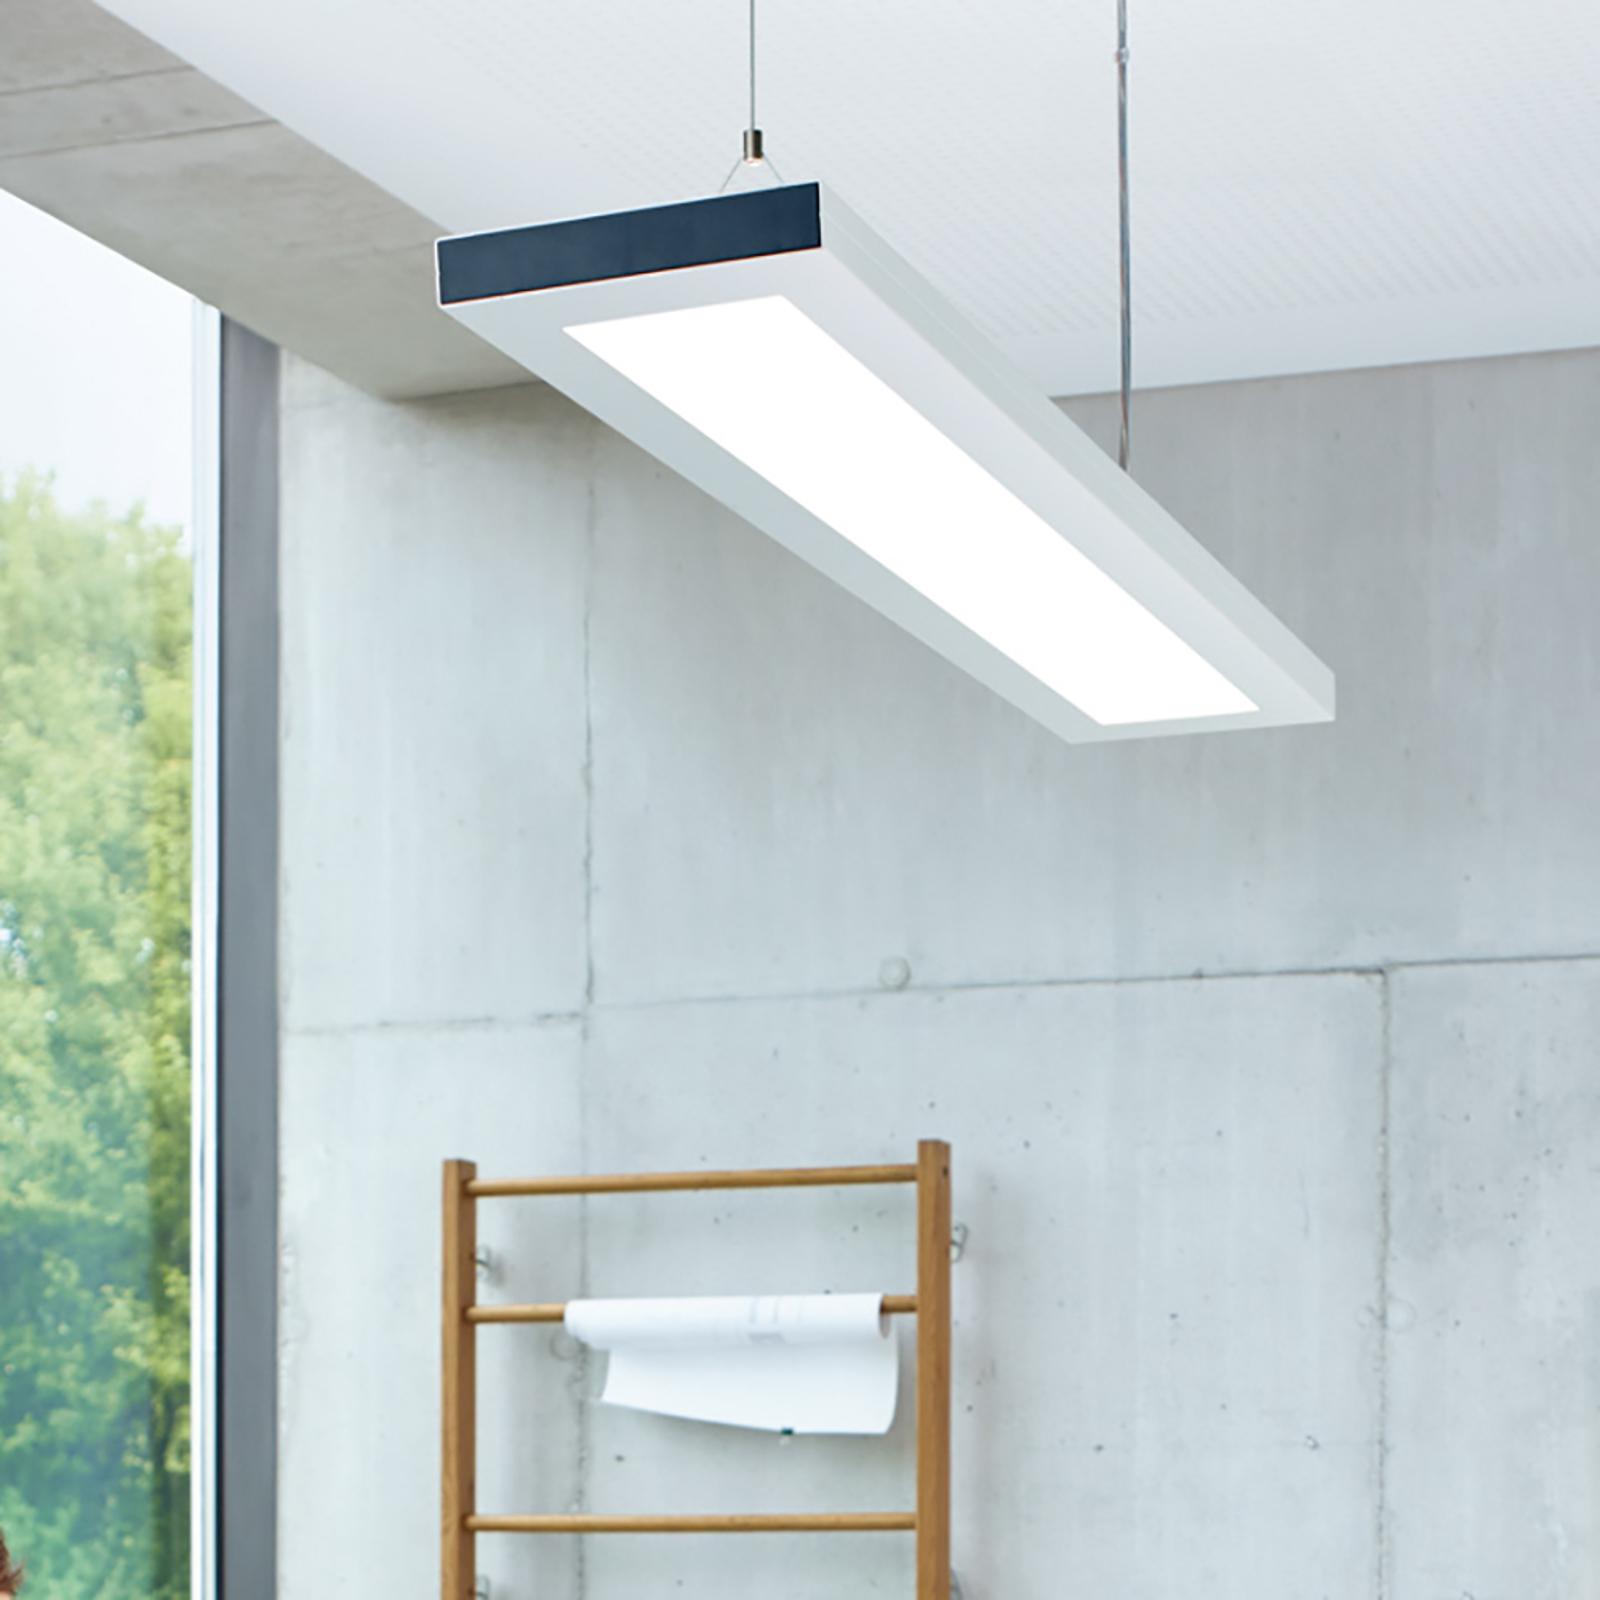 LED hanglamp Lavigo DPP 16000/840/D EVG wit